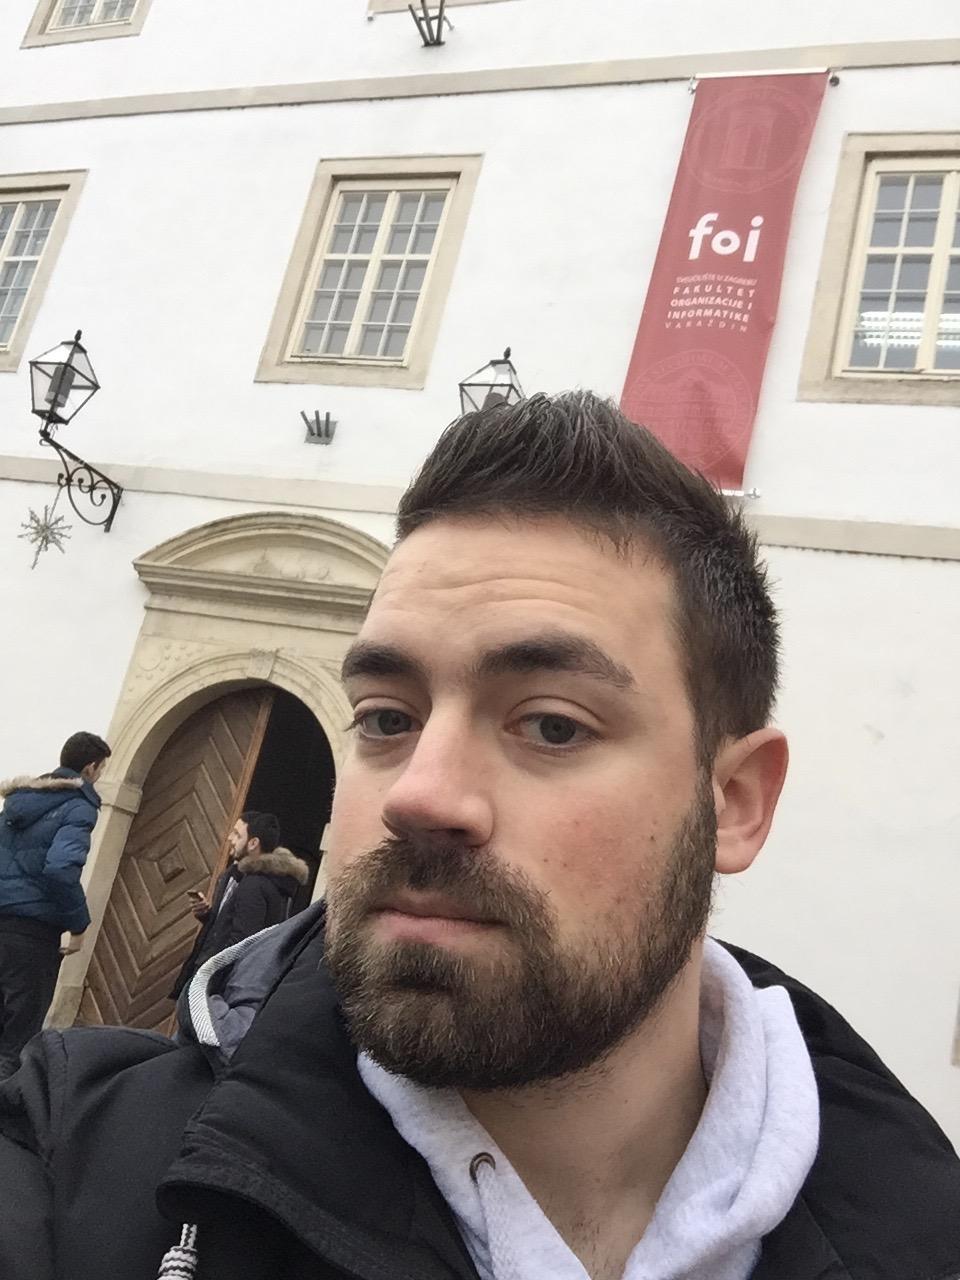 FOI_Kristijan_Gasljevic